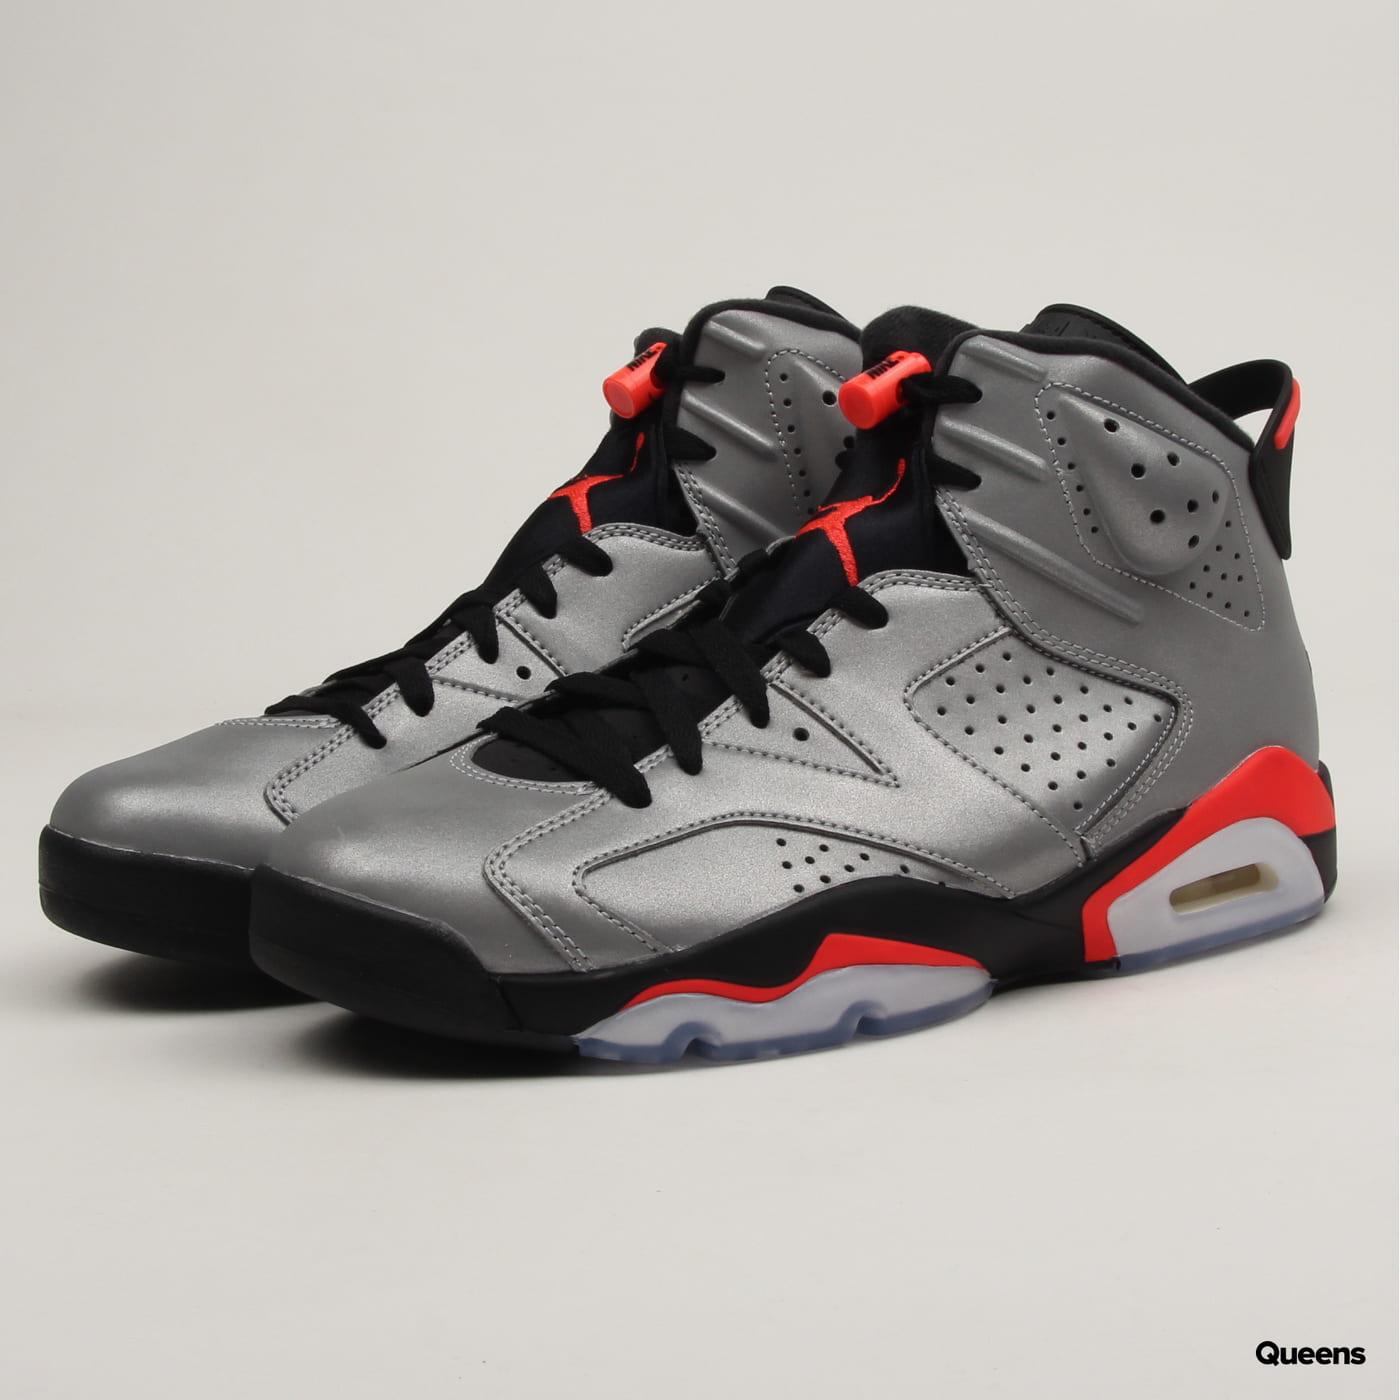 de3f1eb2 Sneakers Jordan Air Jordan 6 Retro SP reflect silver / infrared - black  (CI4072-001) – Queens 💚